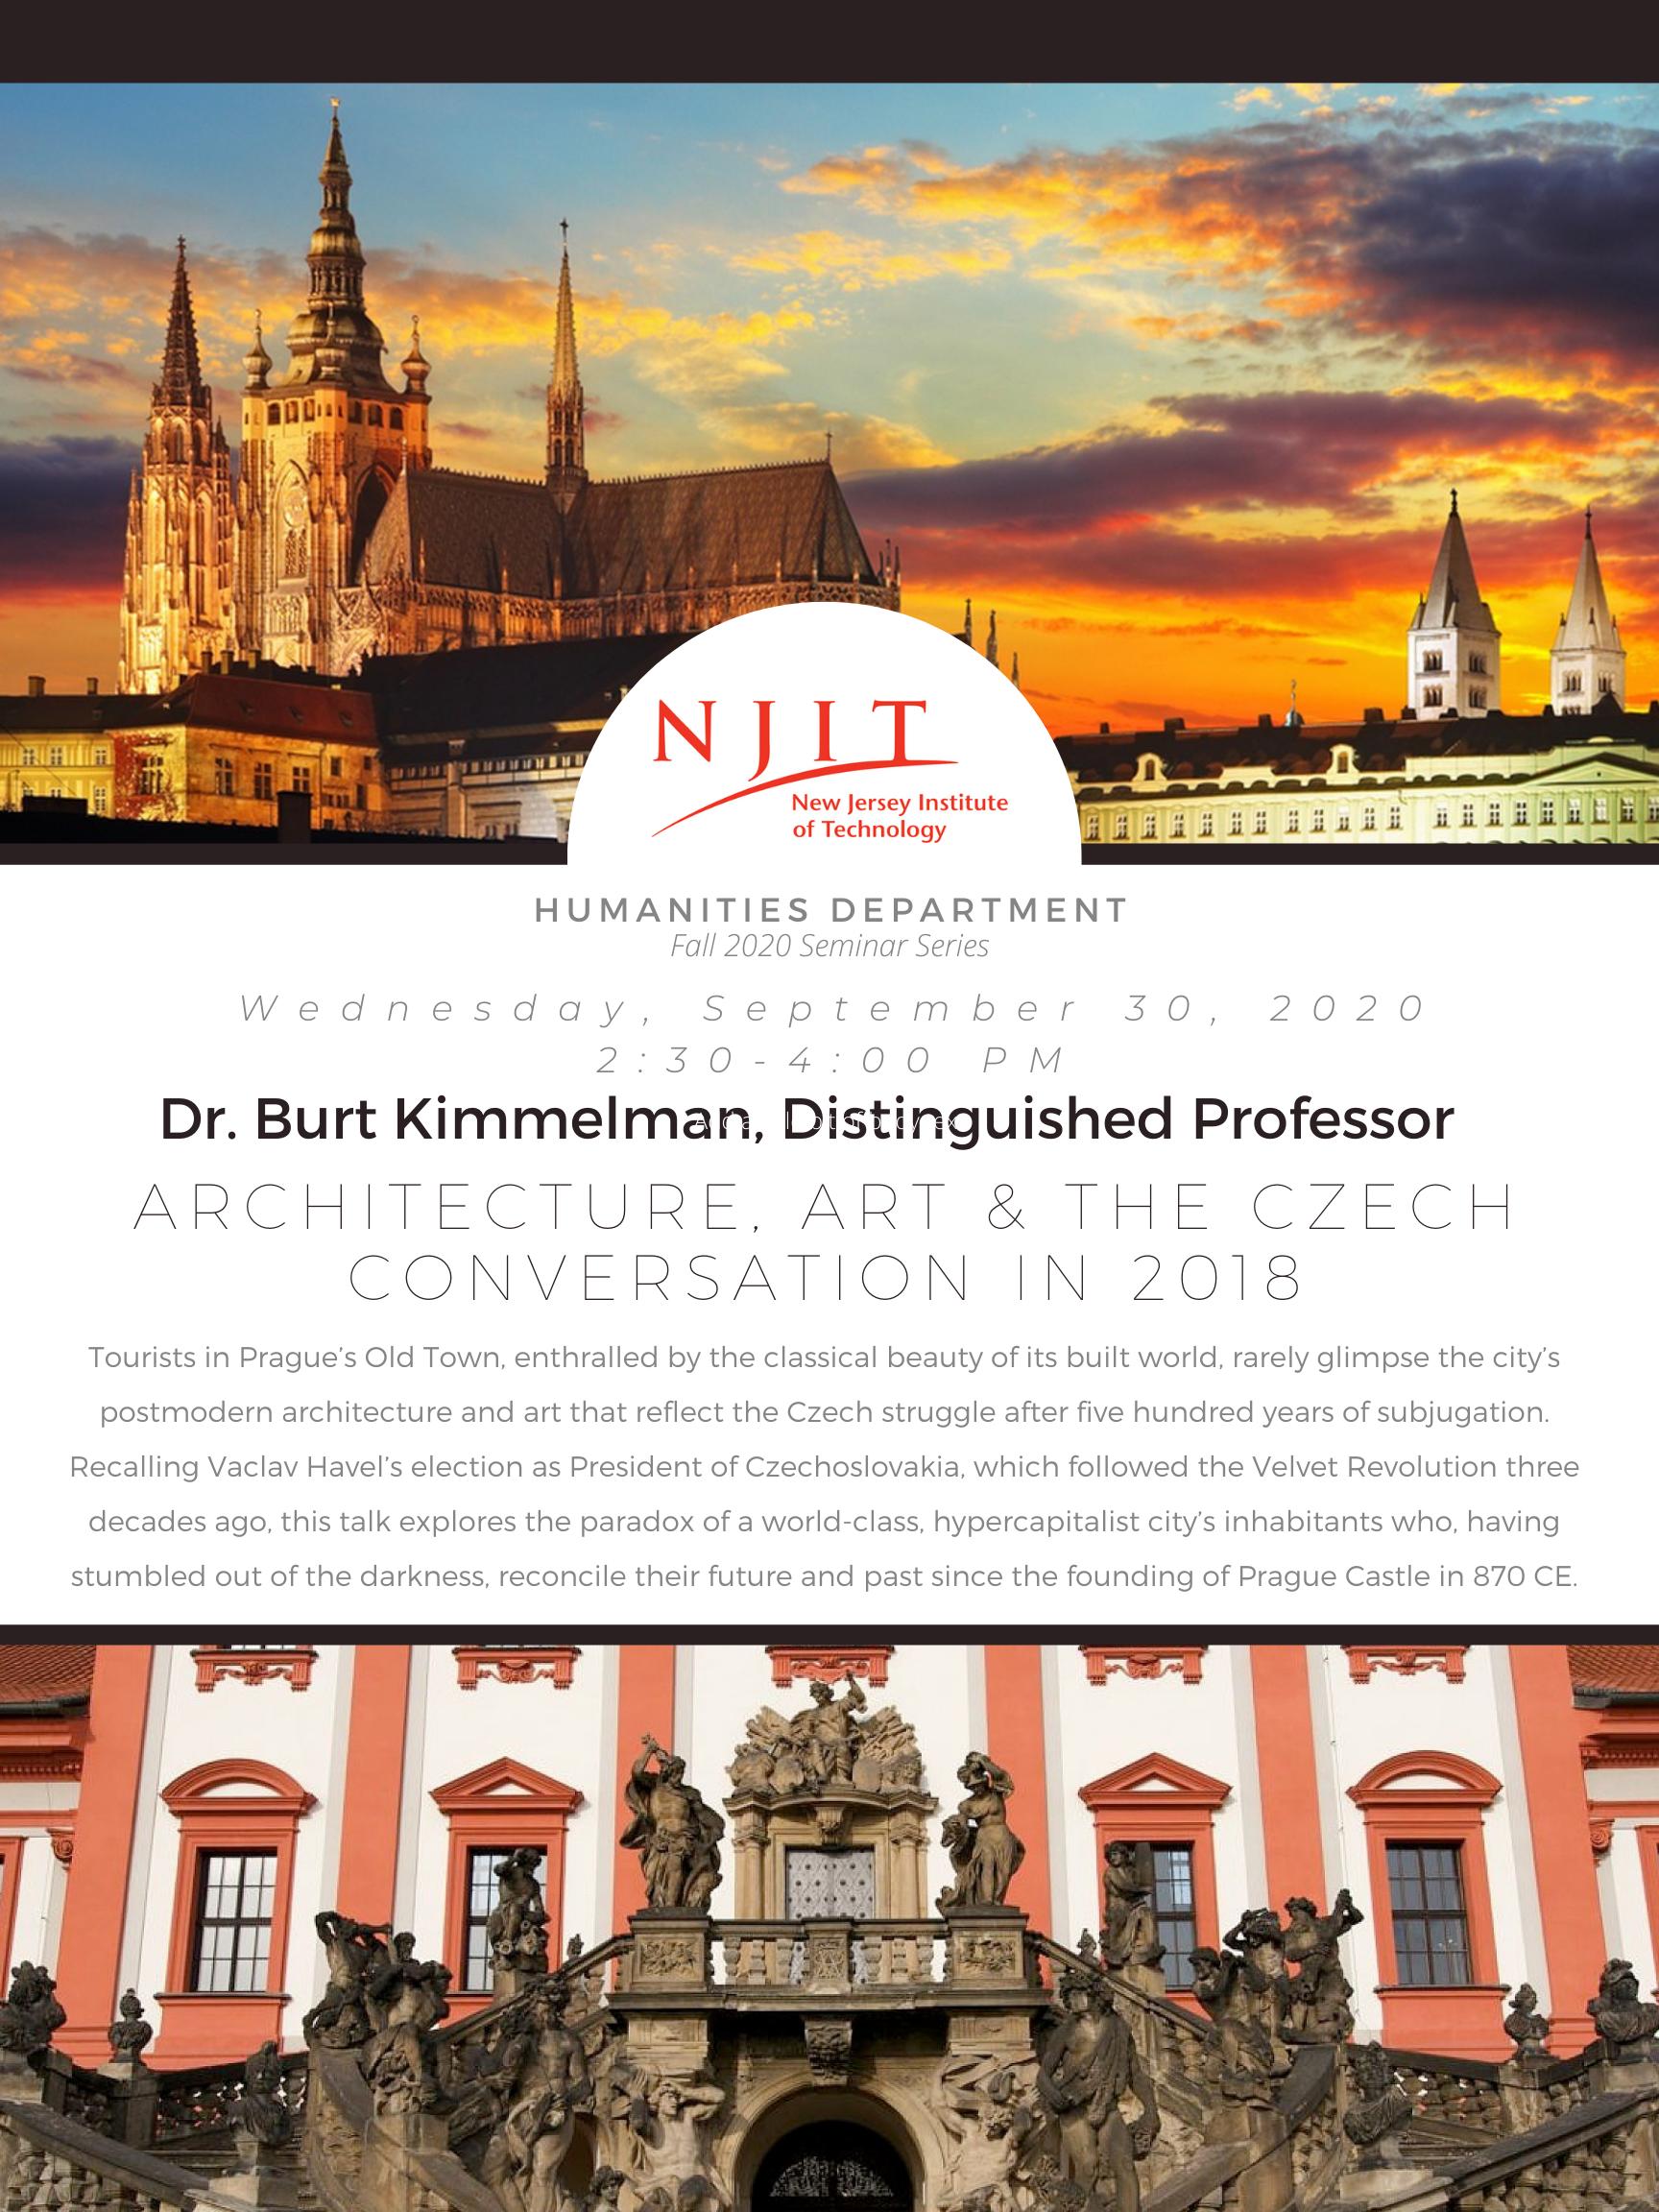 Architecture, Art & the Czech Conversation in 2018